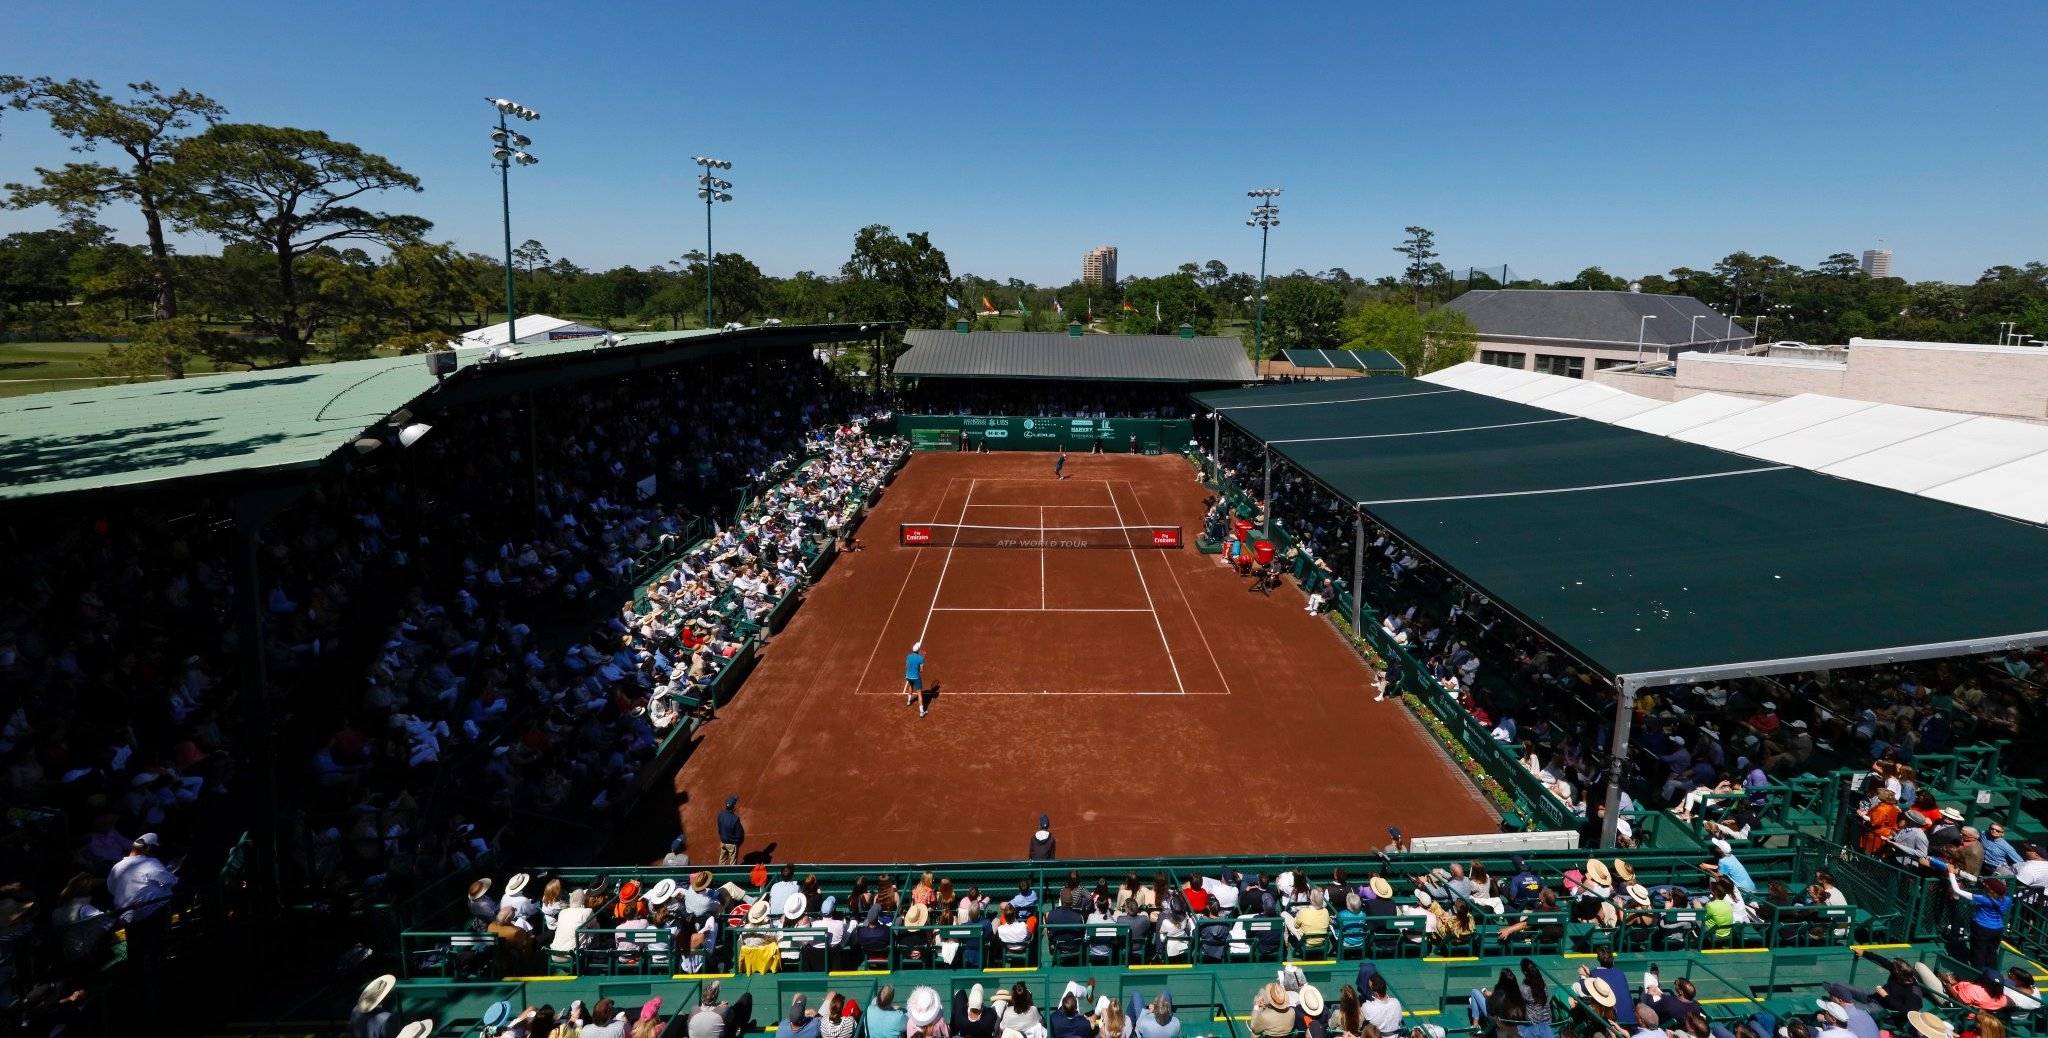 Fayez Sarofim Co U S Men S Clay Court Championship Tennis Forecast